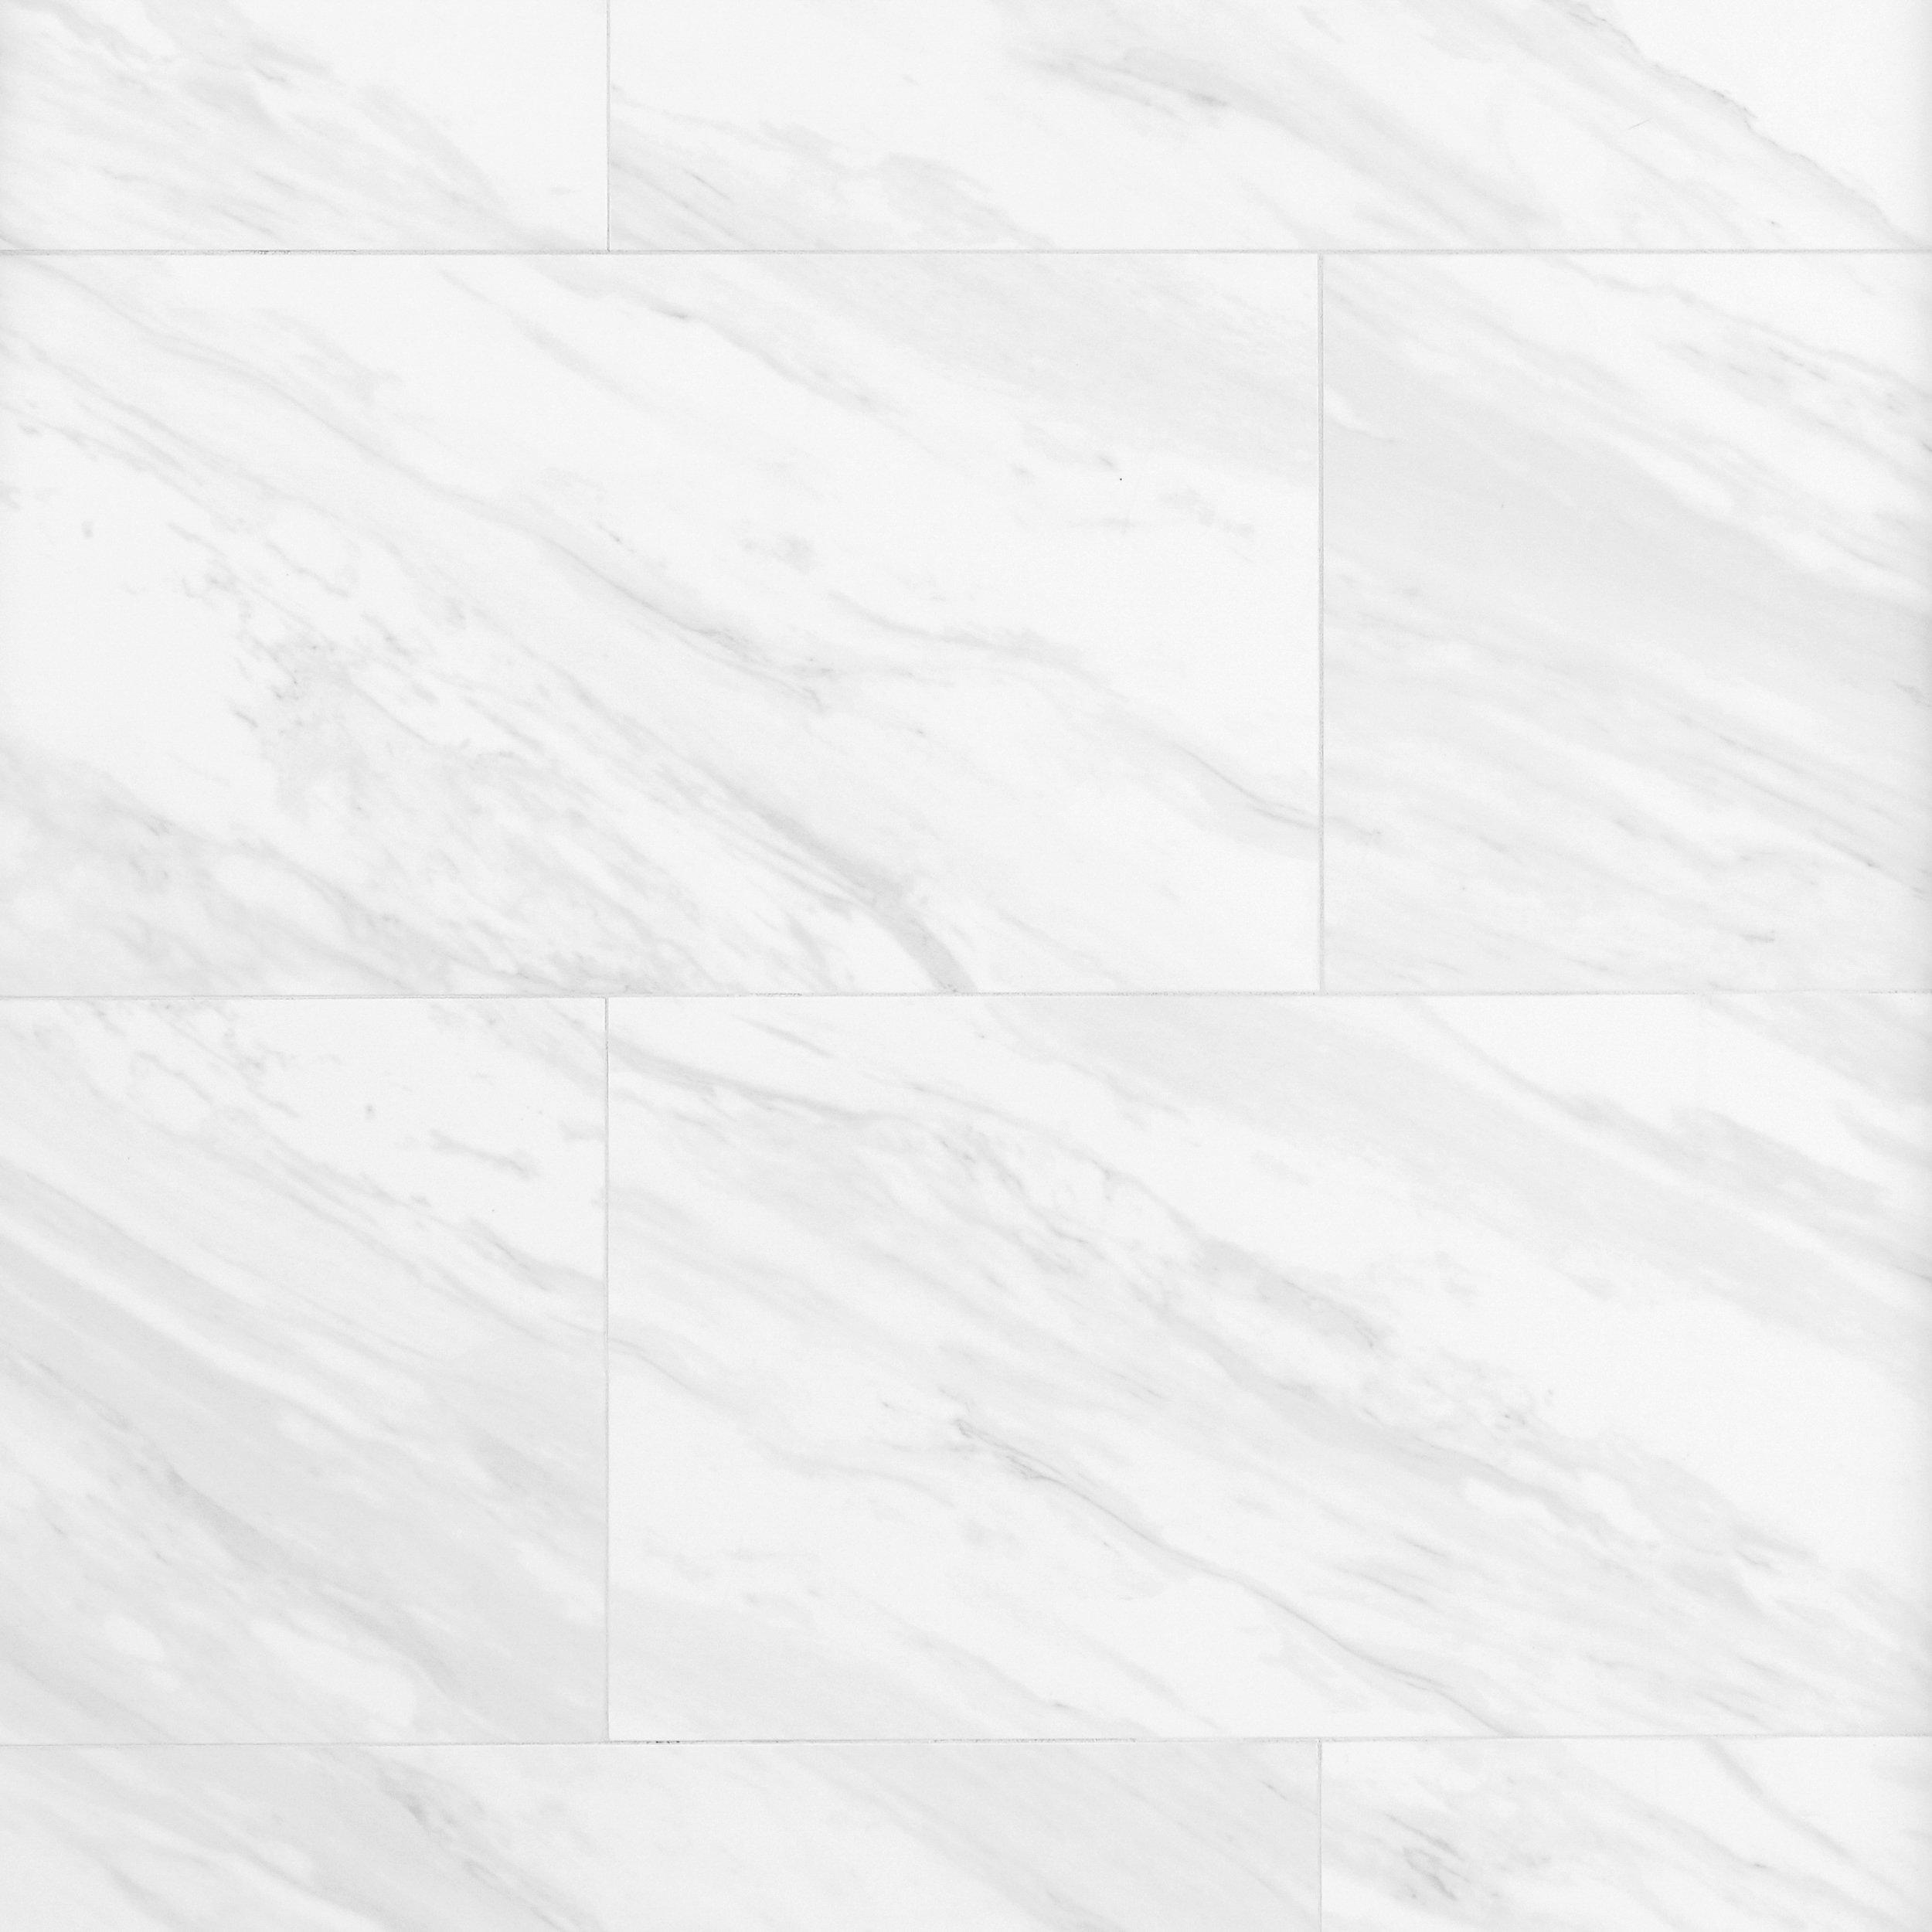 White Porcelain Tile Floor Style Selections Futuro White Porcelain ...